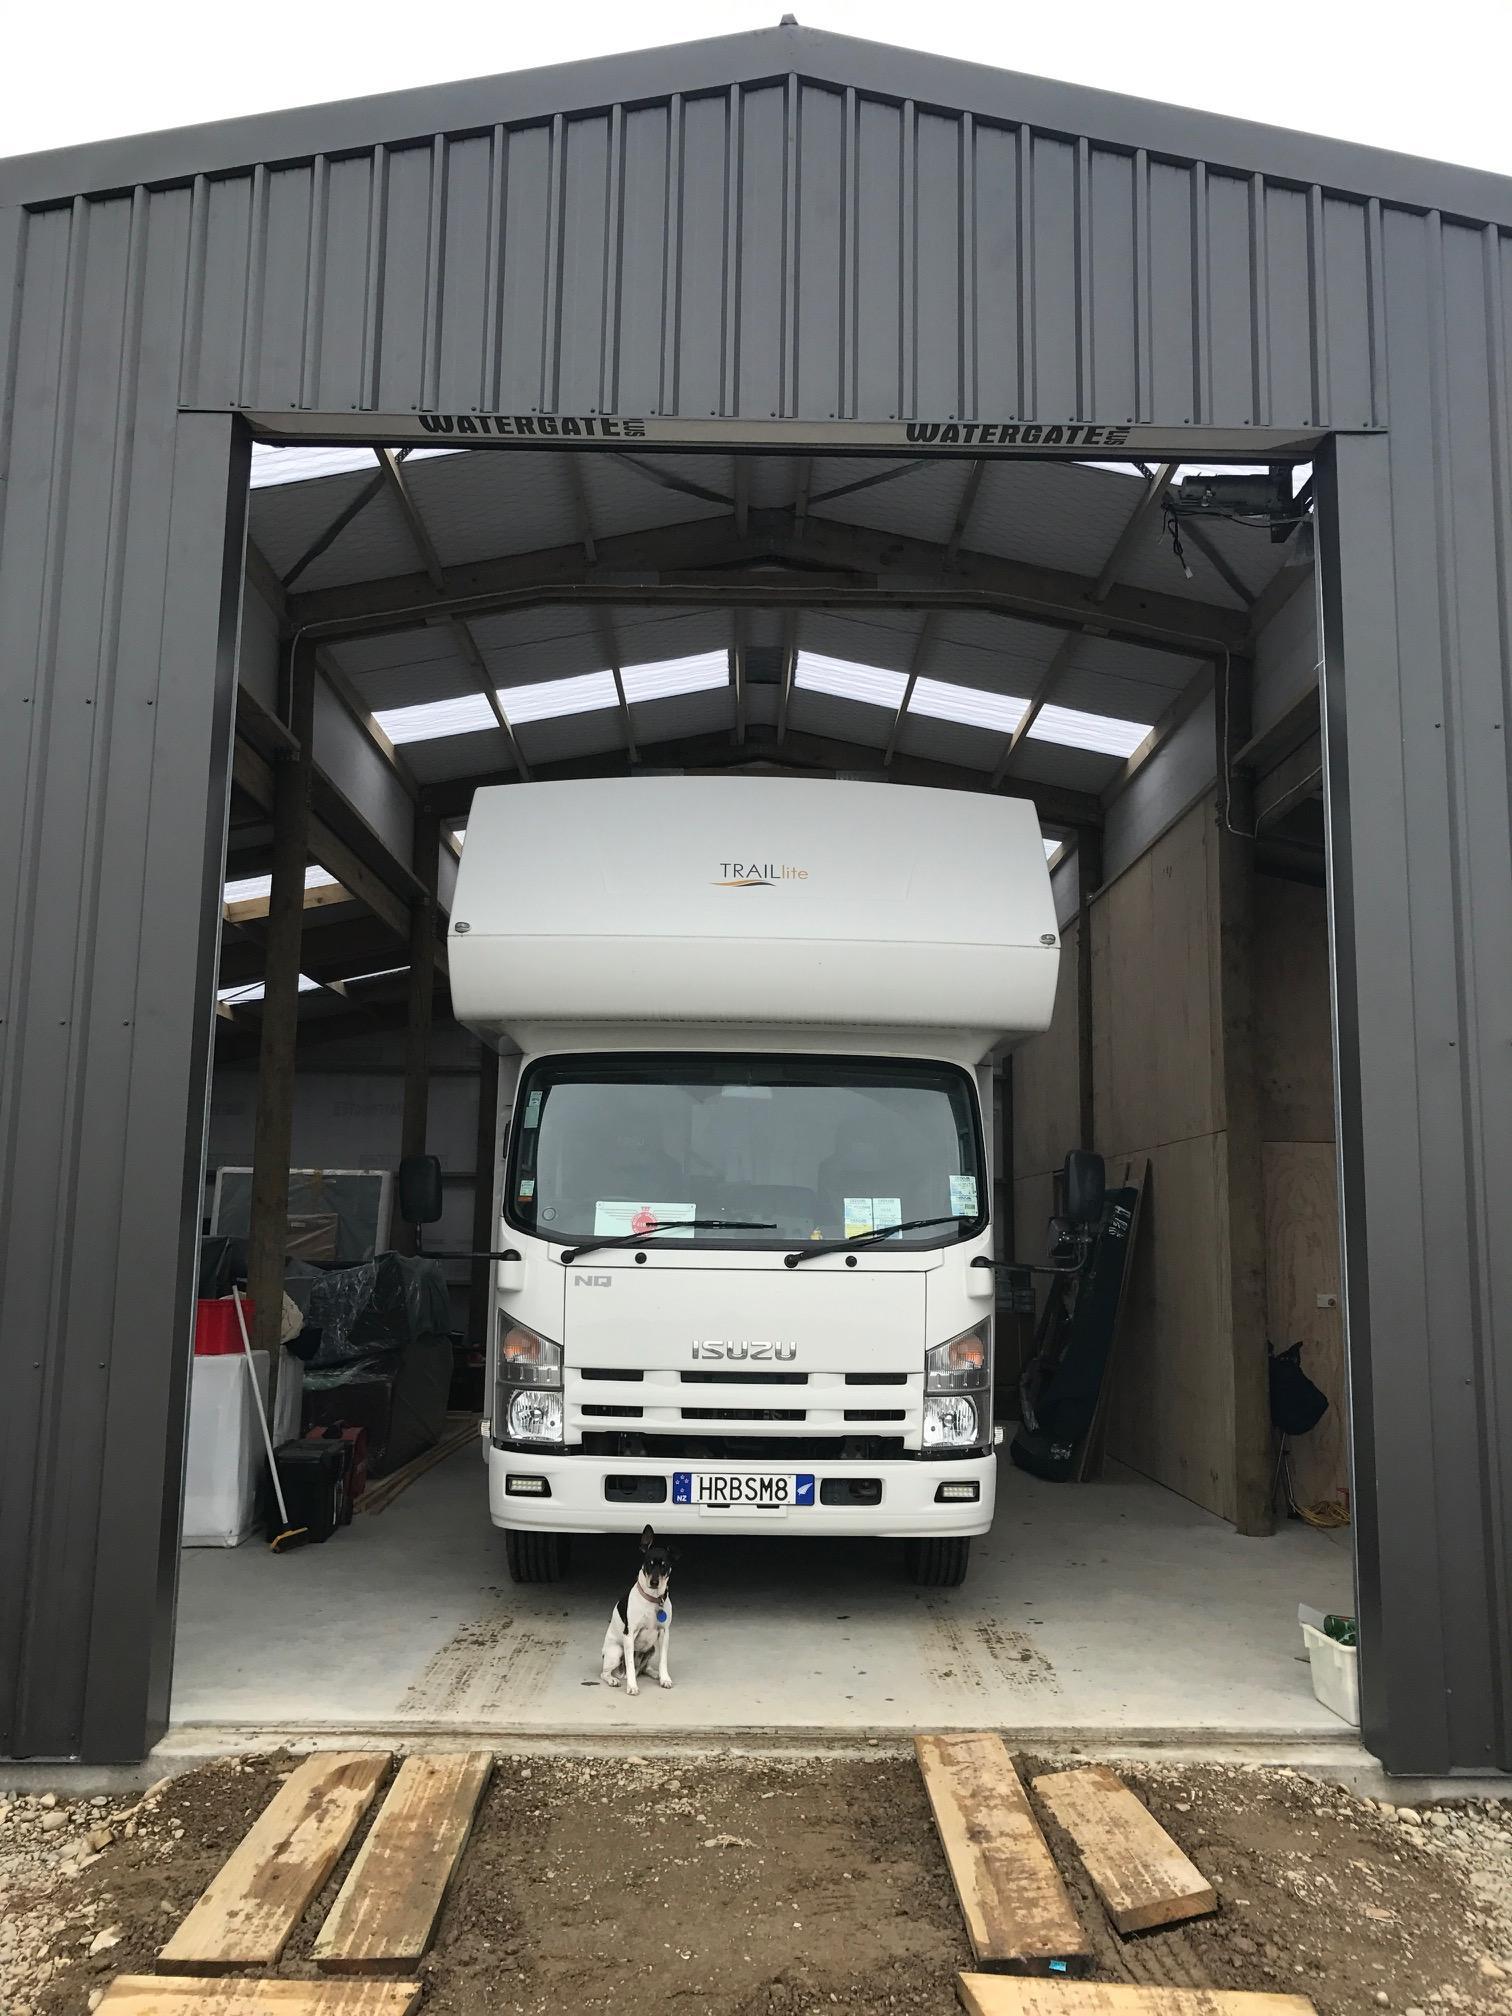 motorhome storage shed